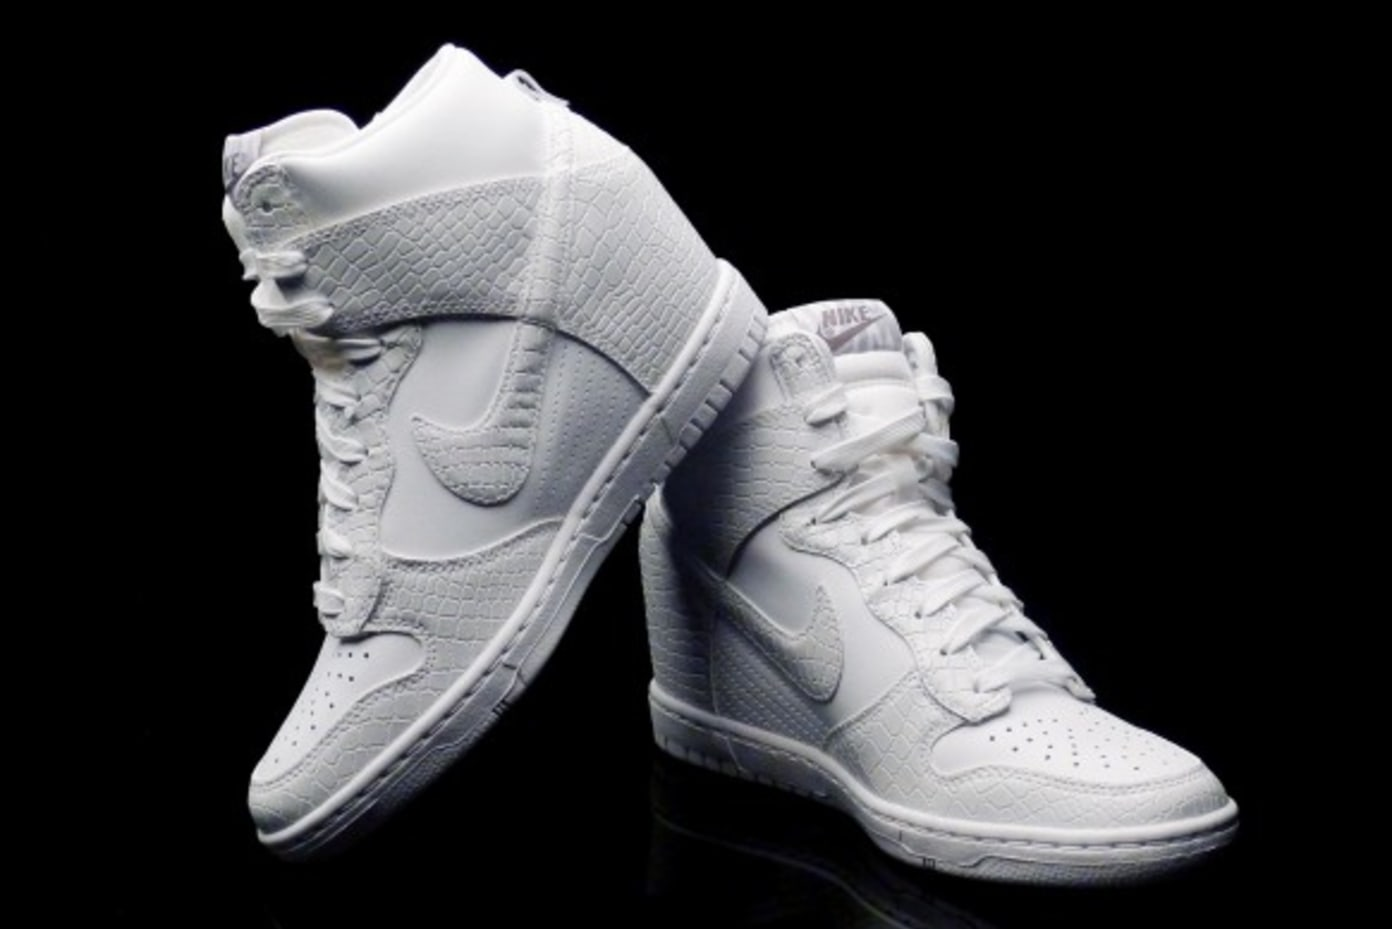 Nike WMNS Dunk Sky Hi White | Shelflife